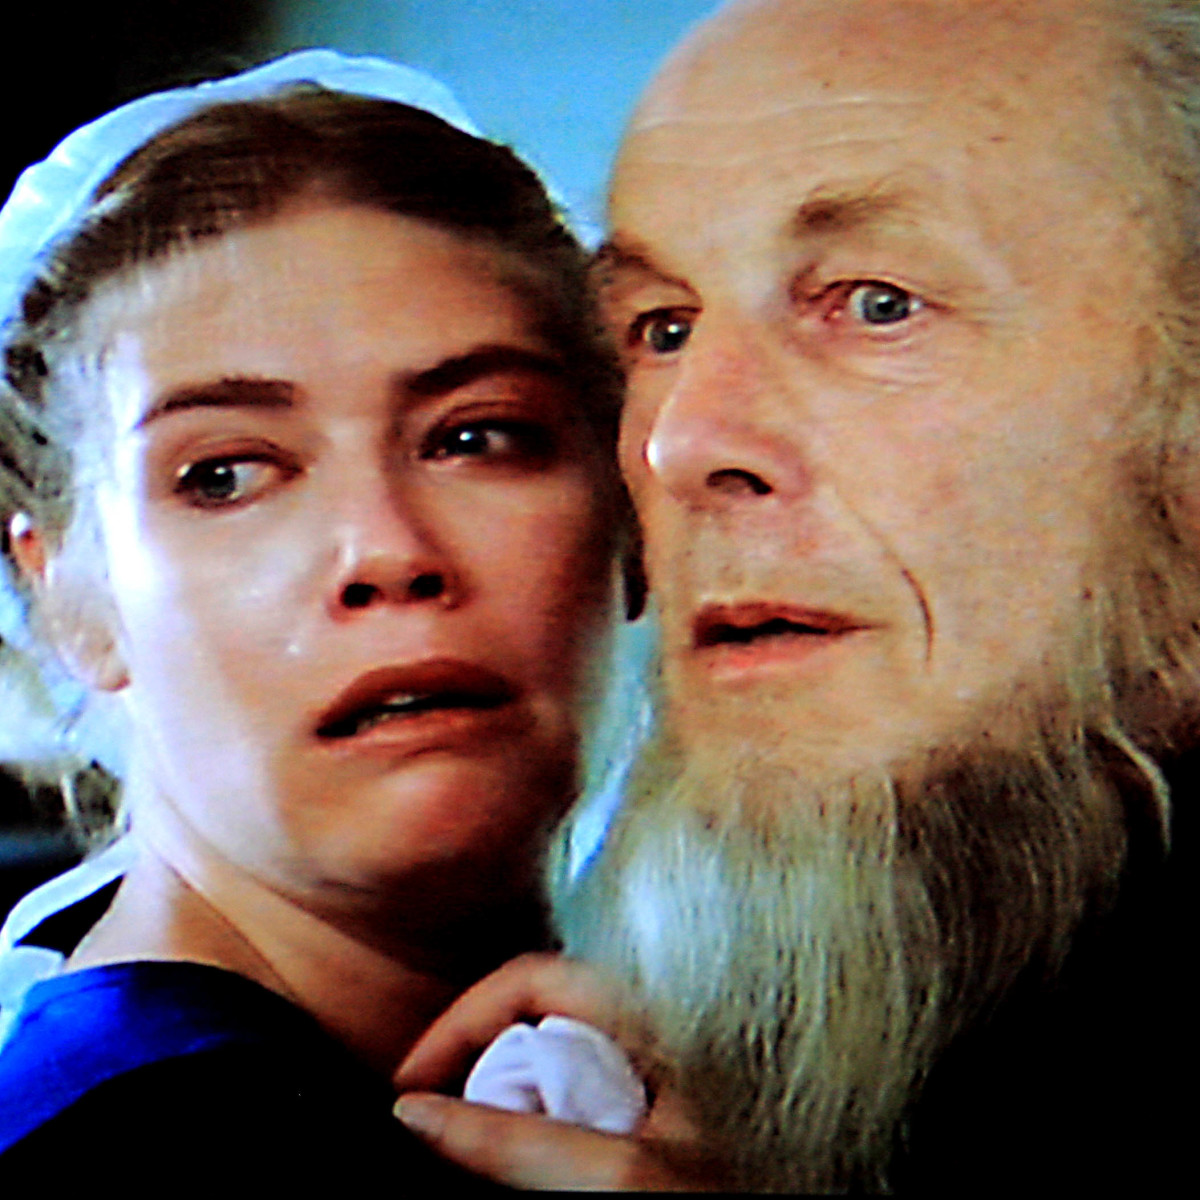 Rachel and Eli Lapp in fear of the gunmen